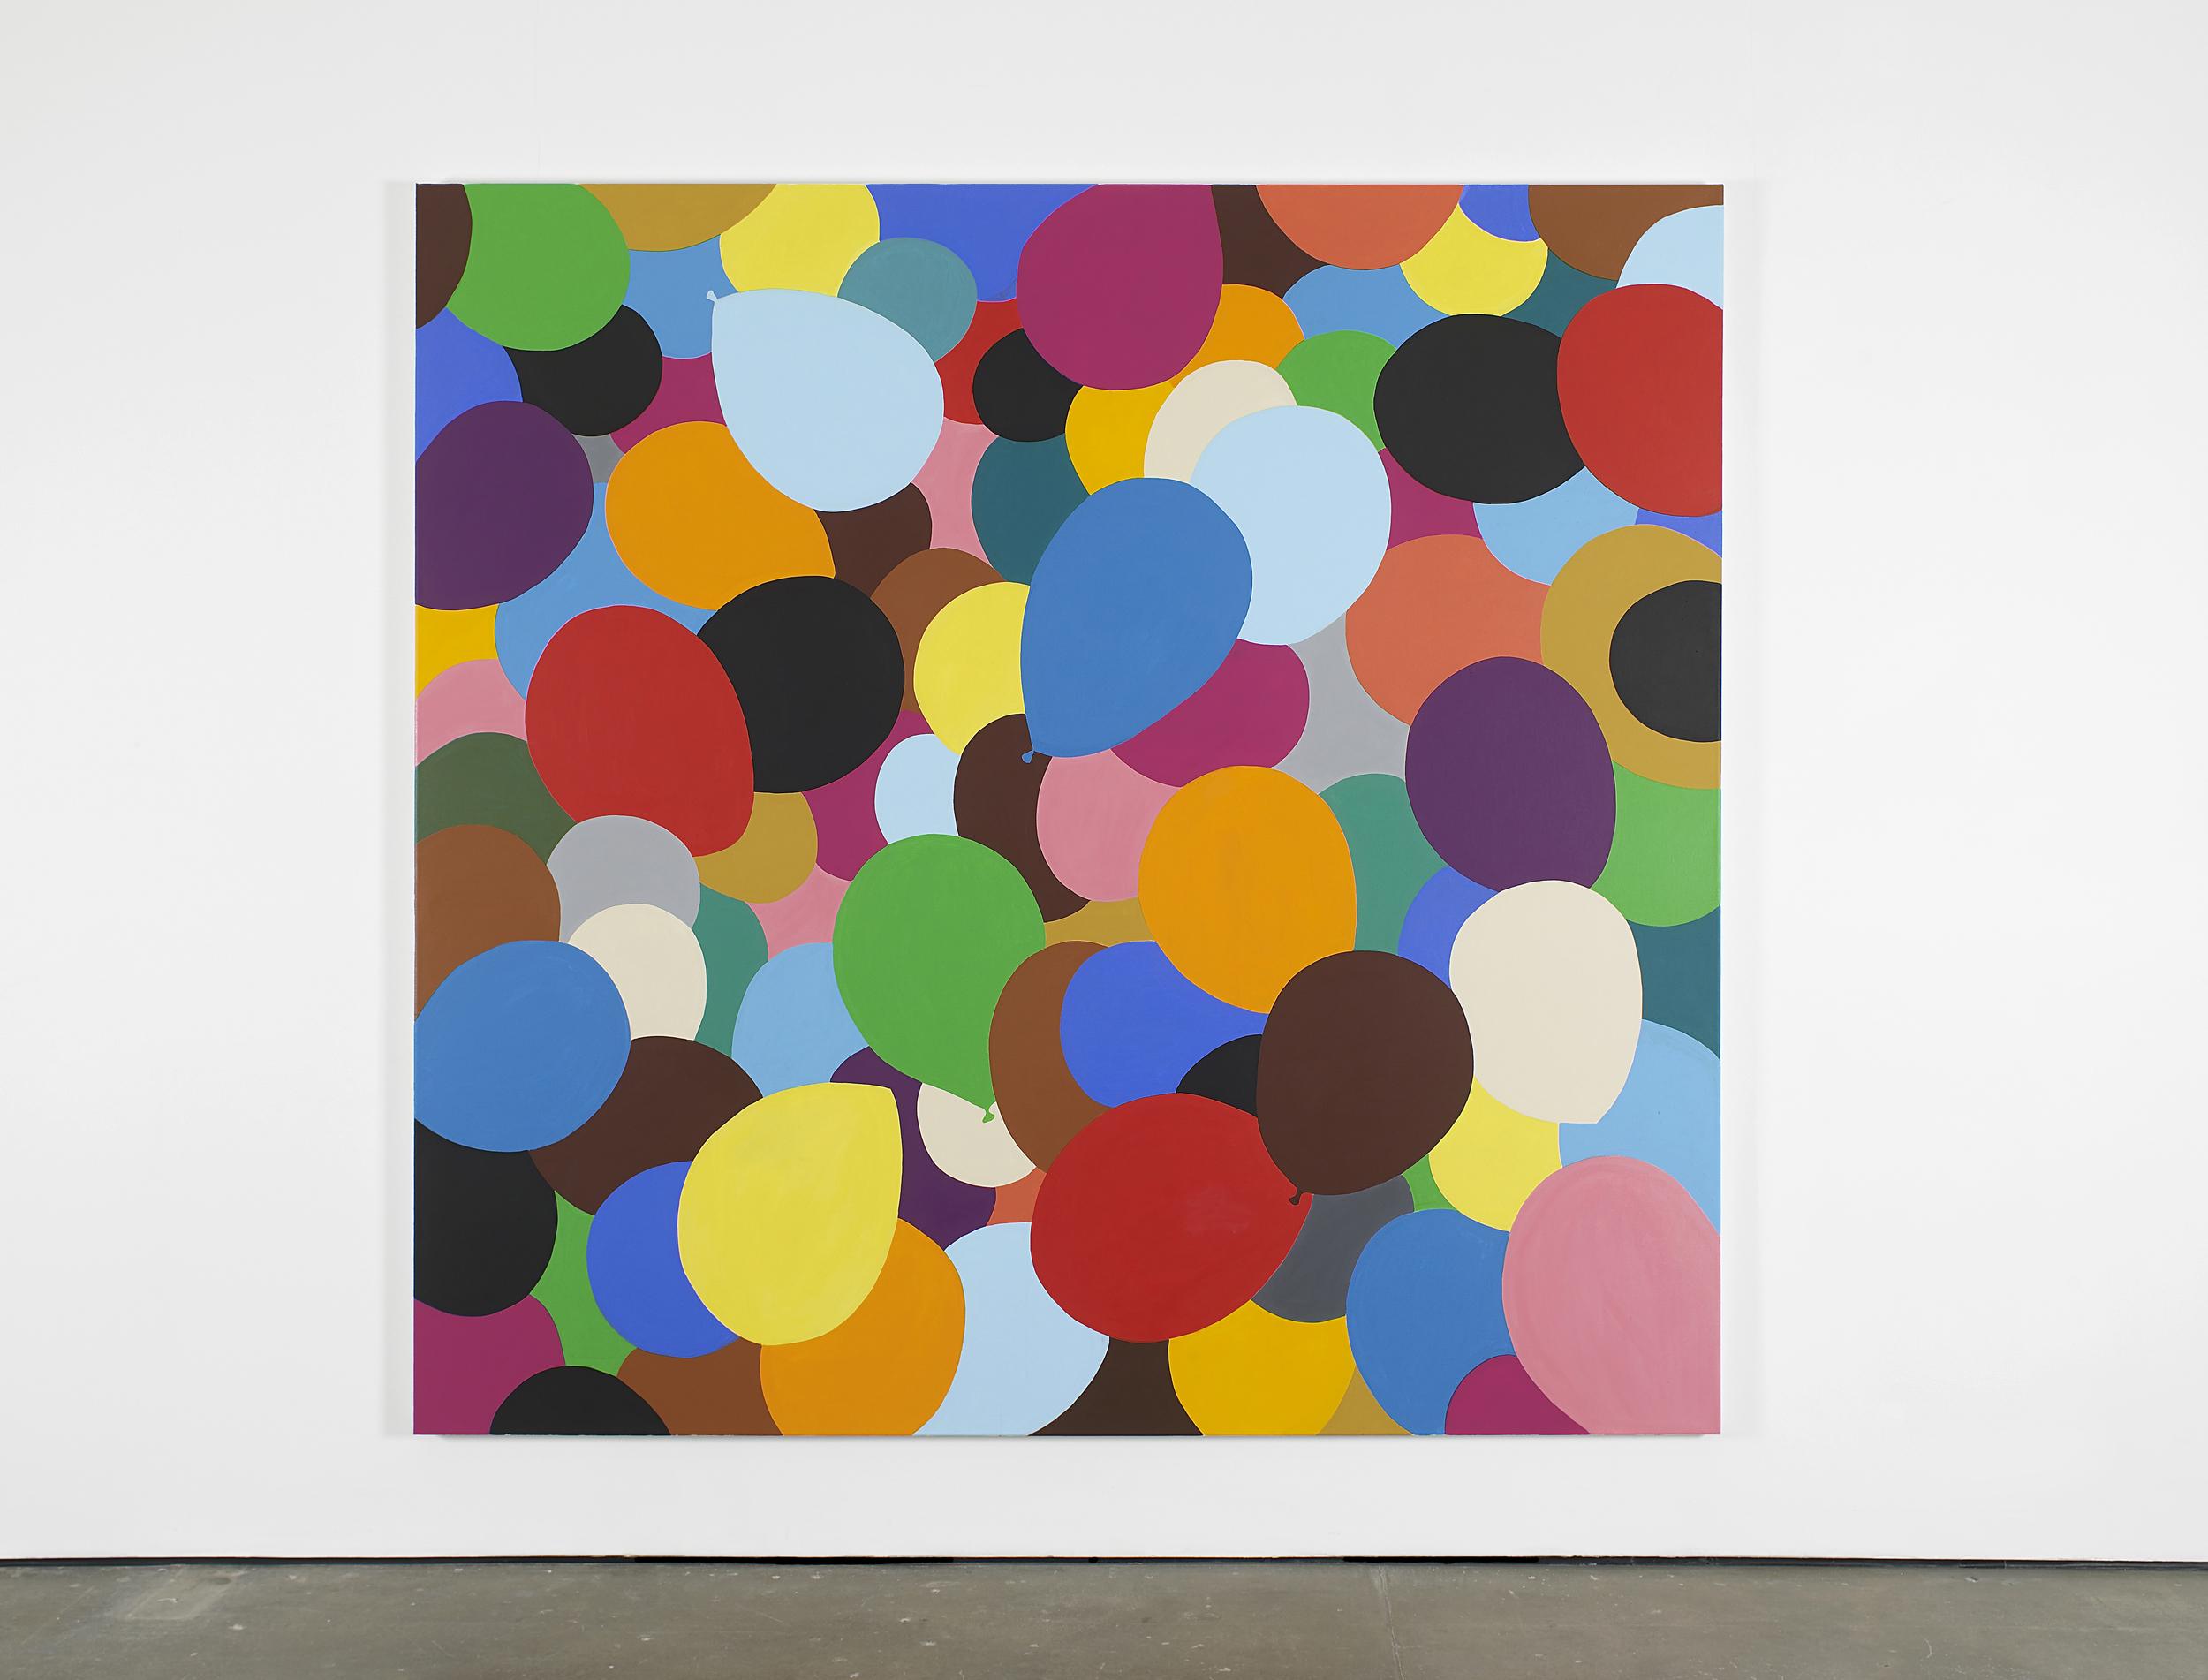 Neunundneunzig Luftballons 2014 Acrylic on canvas 225 x 235 cm / 88.5 x 92.5 in